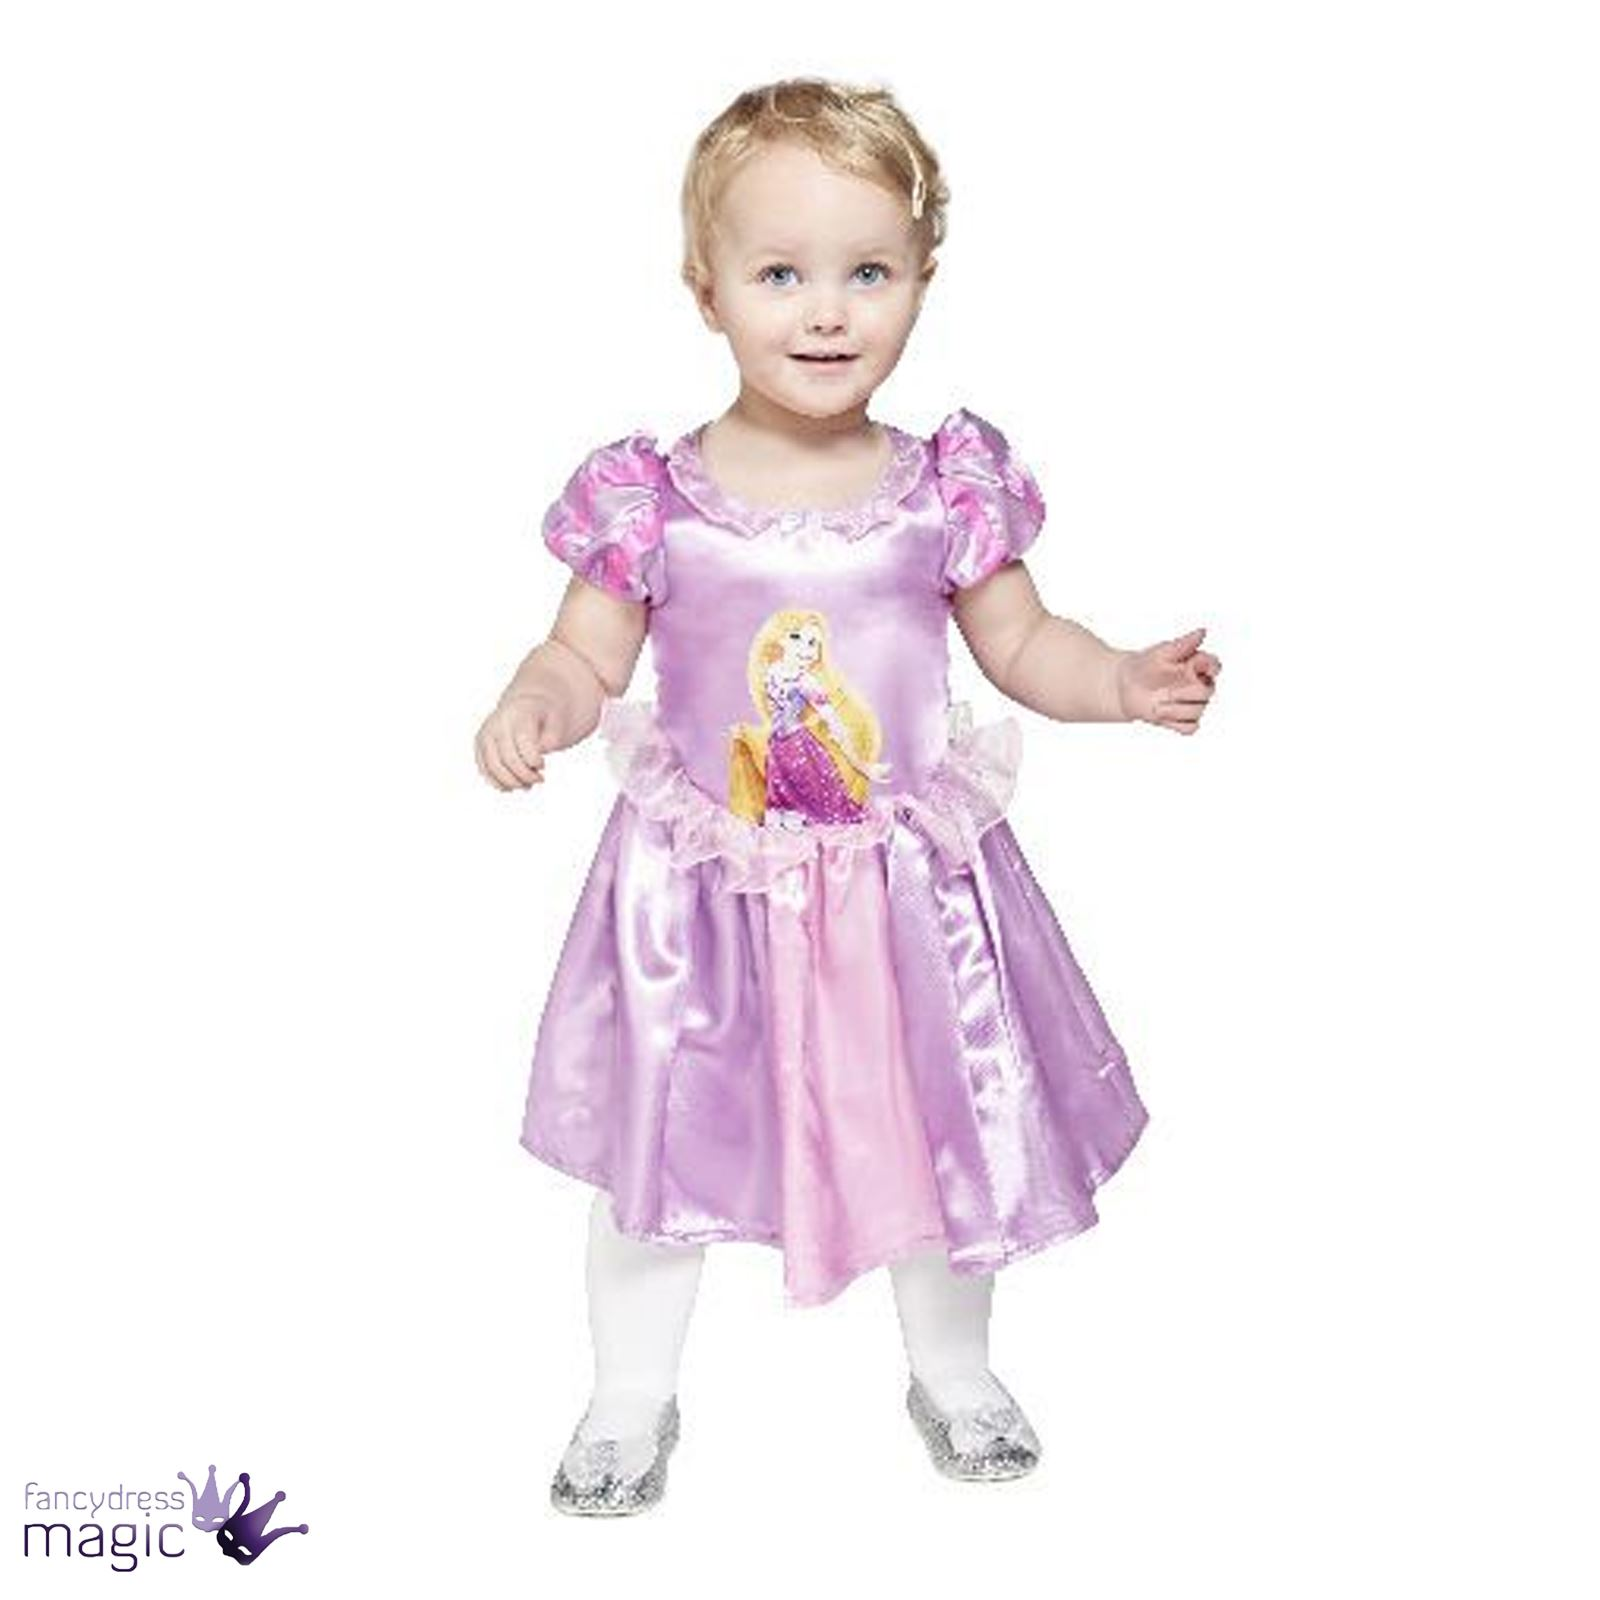 Girl Baby Toddler Disney Princess Fairy Tale Dress Up